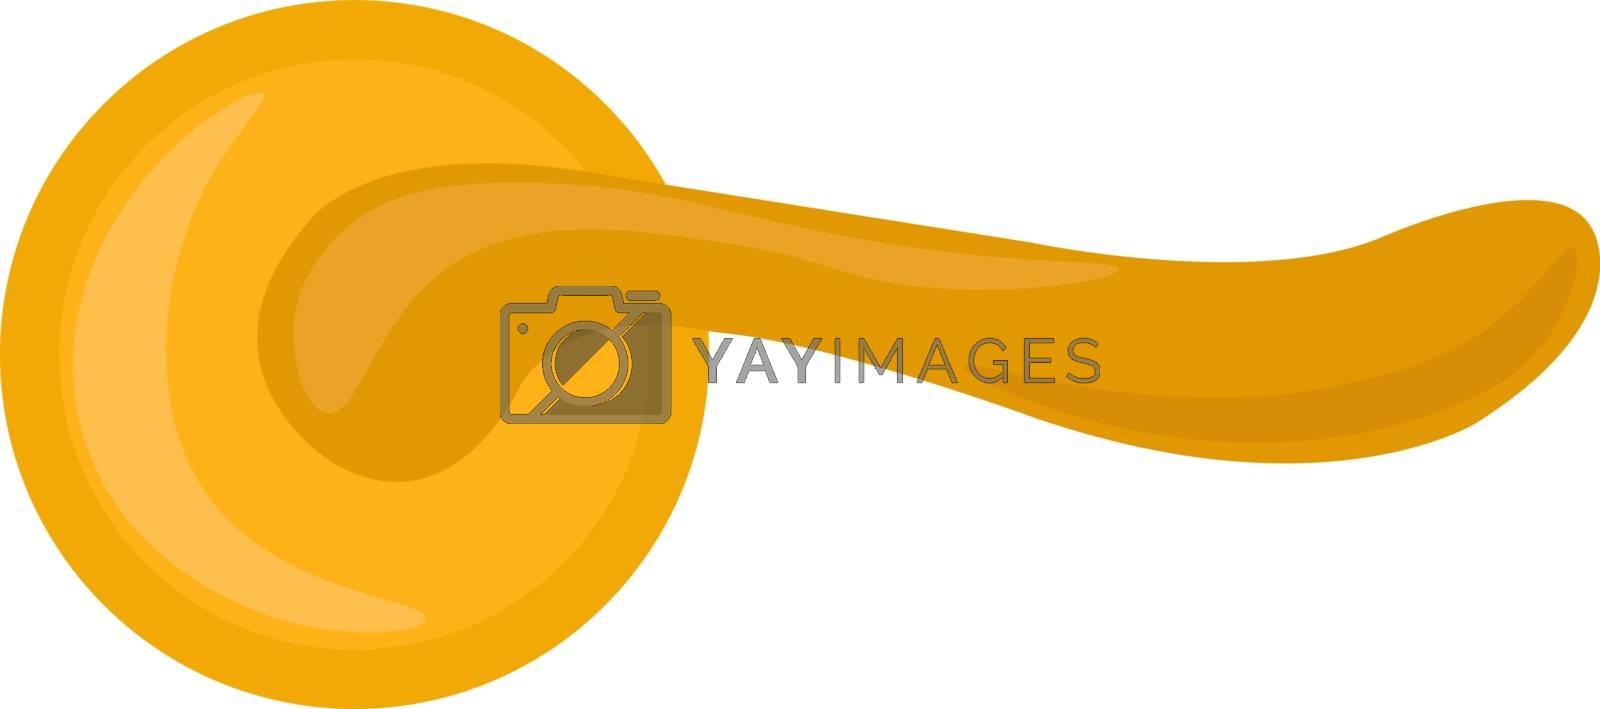 Golden handle, illustration, vector on white background.